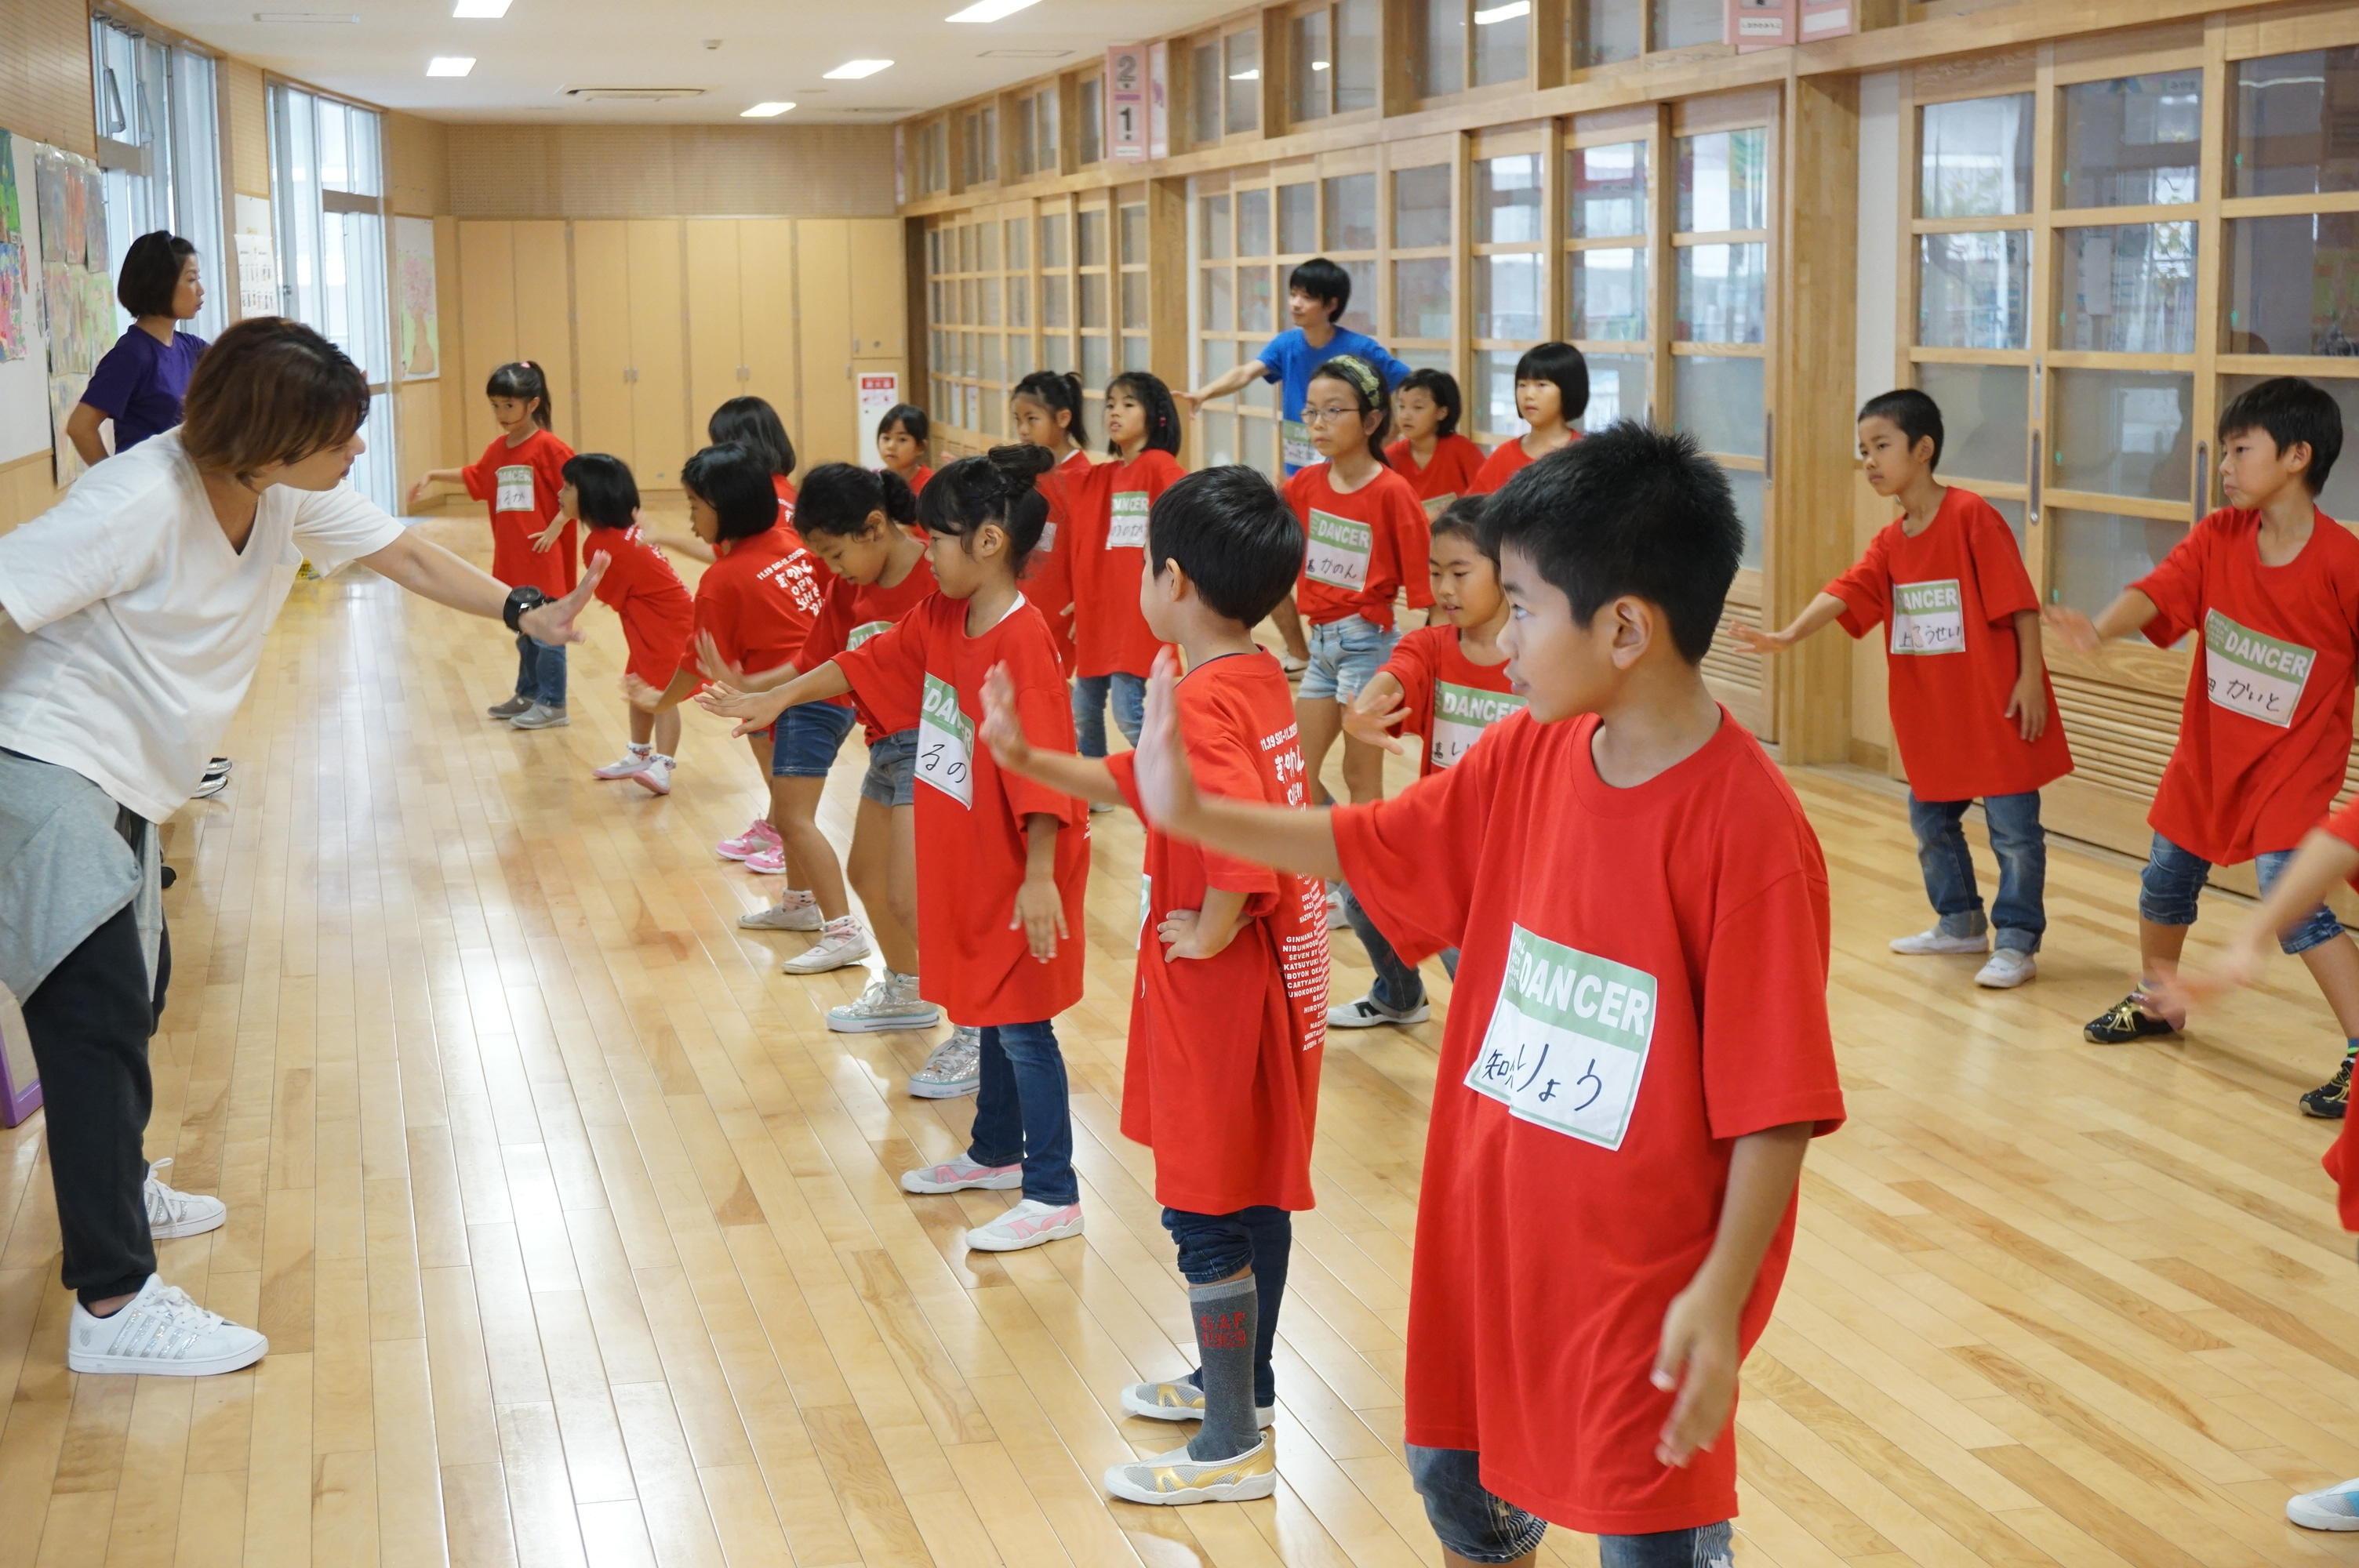 http://news.yoshimoto.co.jp/20161121152925-5fe5a776d5f997c44cf8faad3742e69e51e17823.jpg